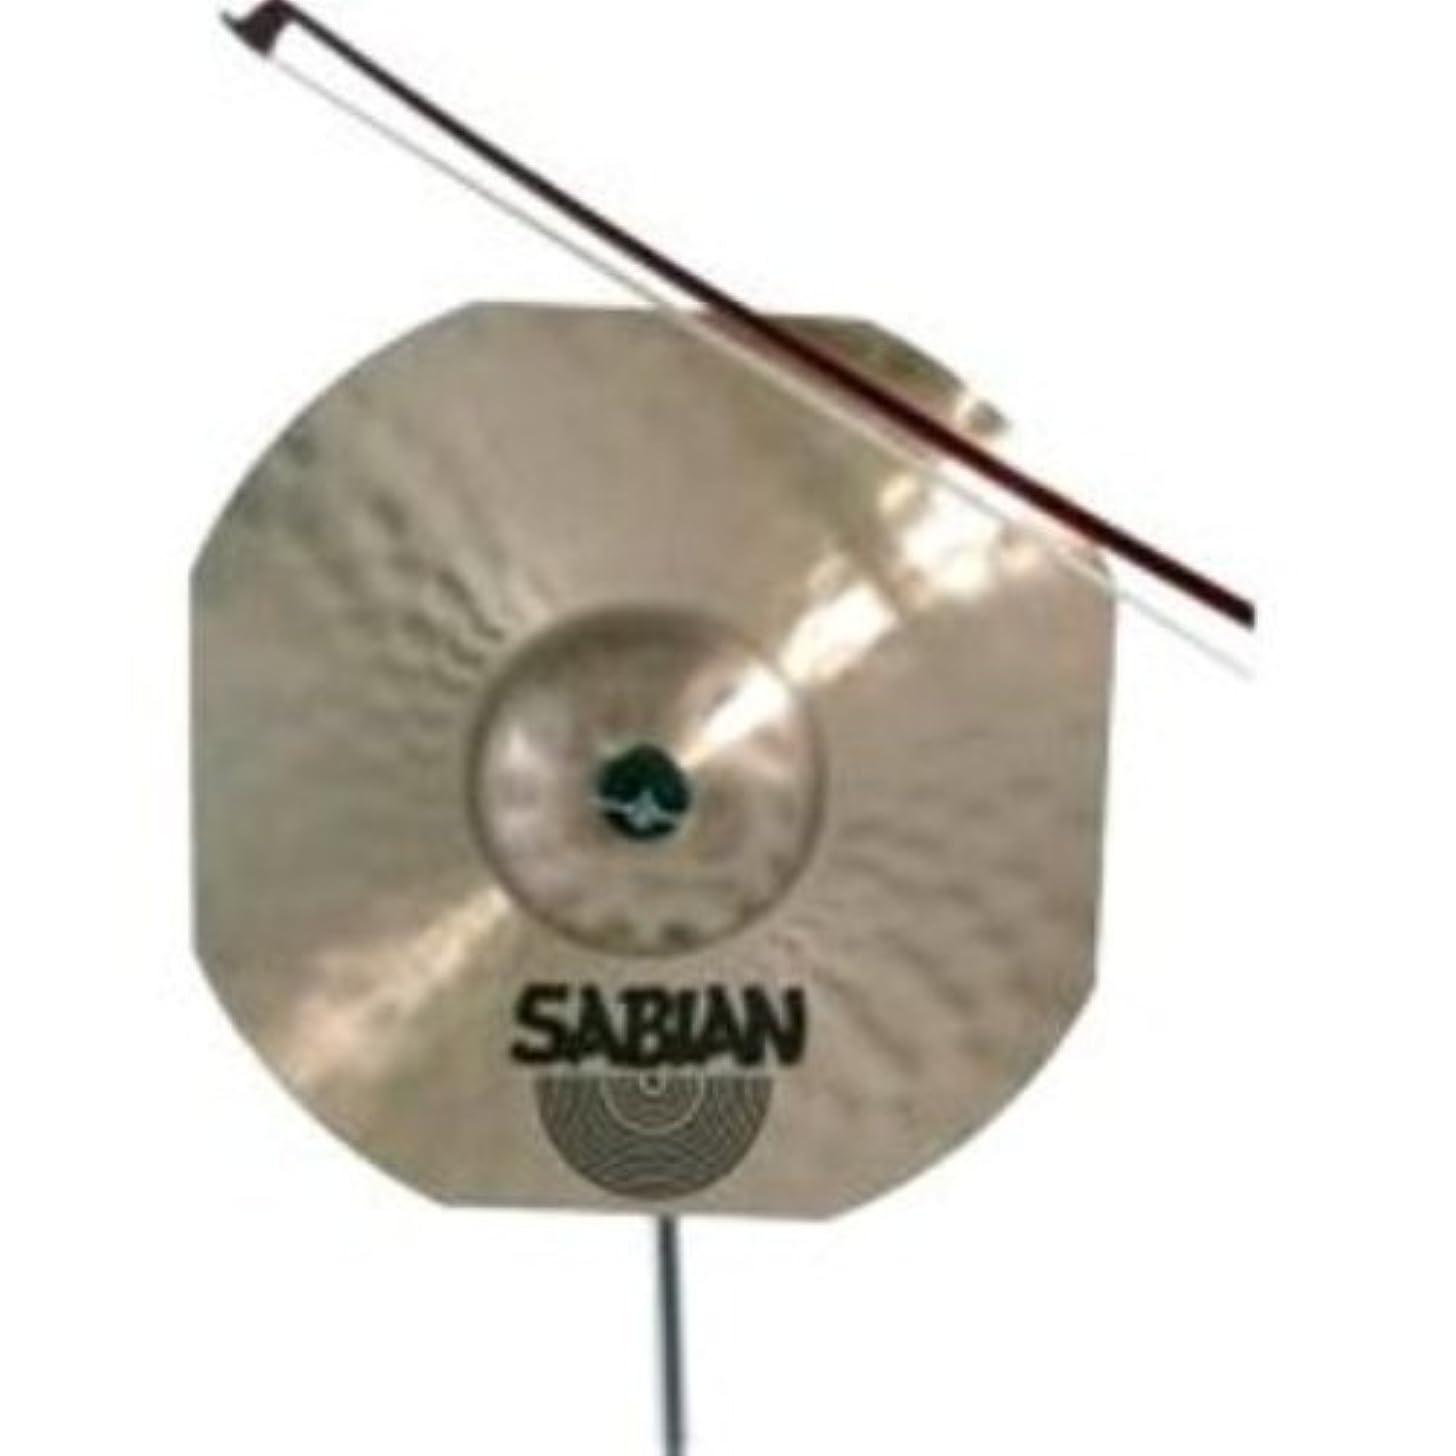 Sabian BOW16 16-Inch HHX Becker Bow Cymbal